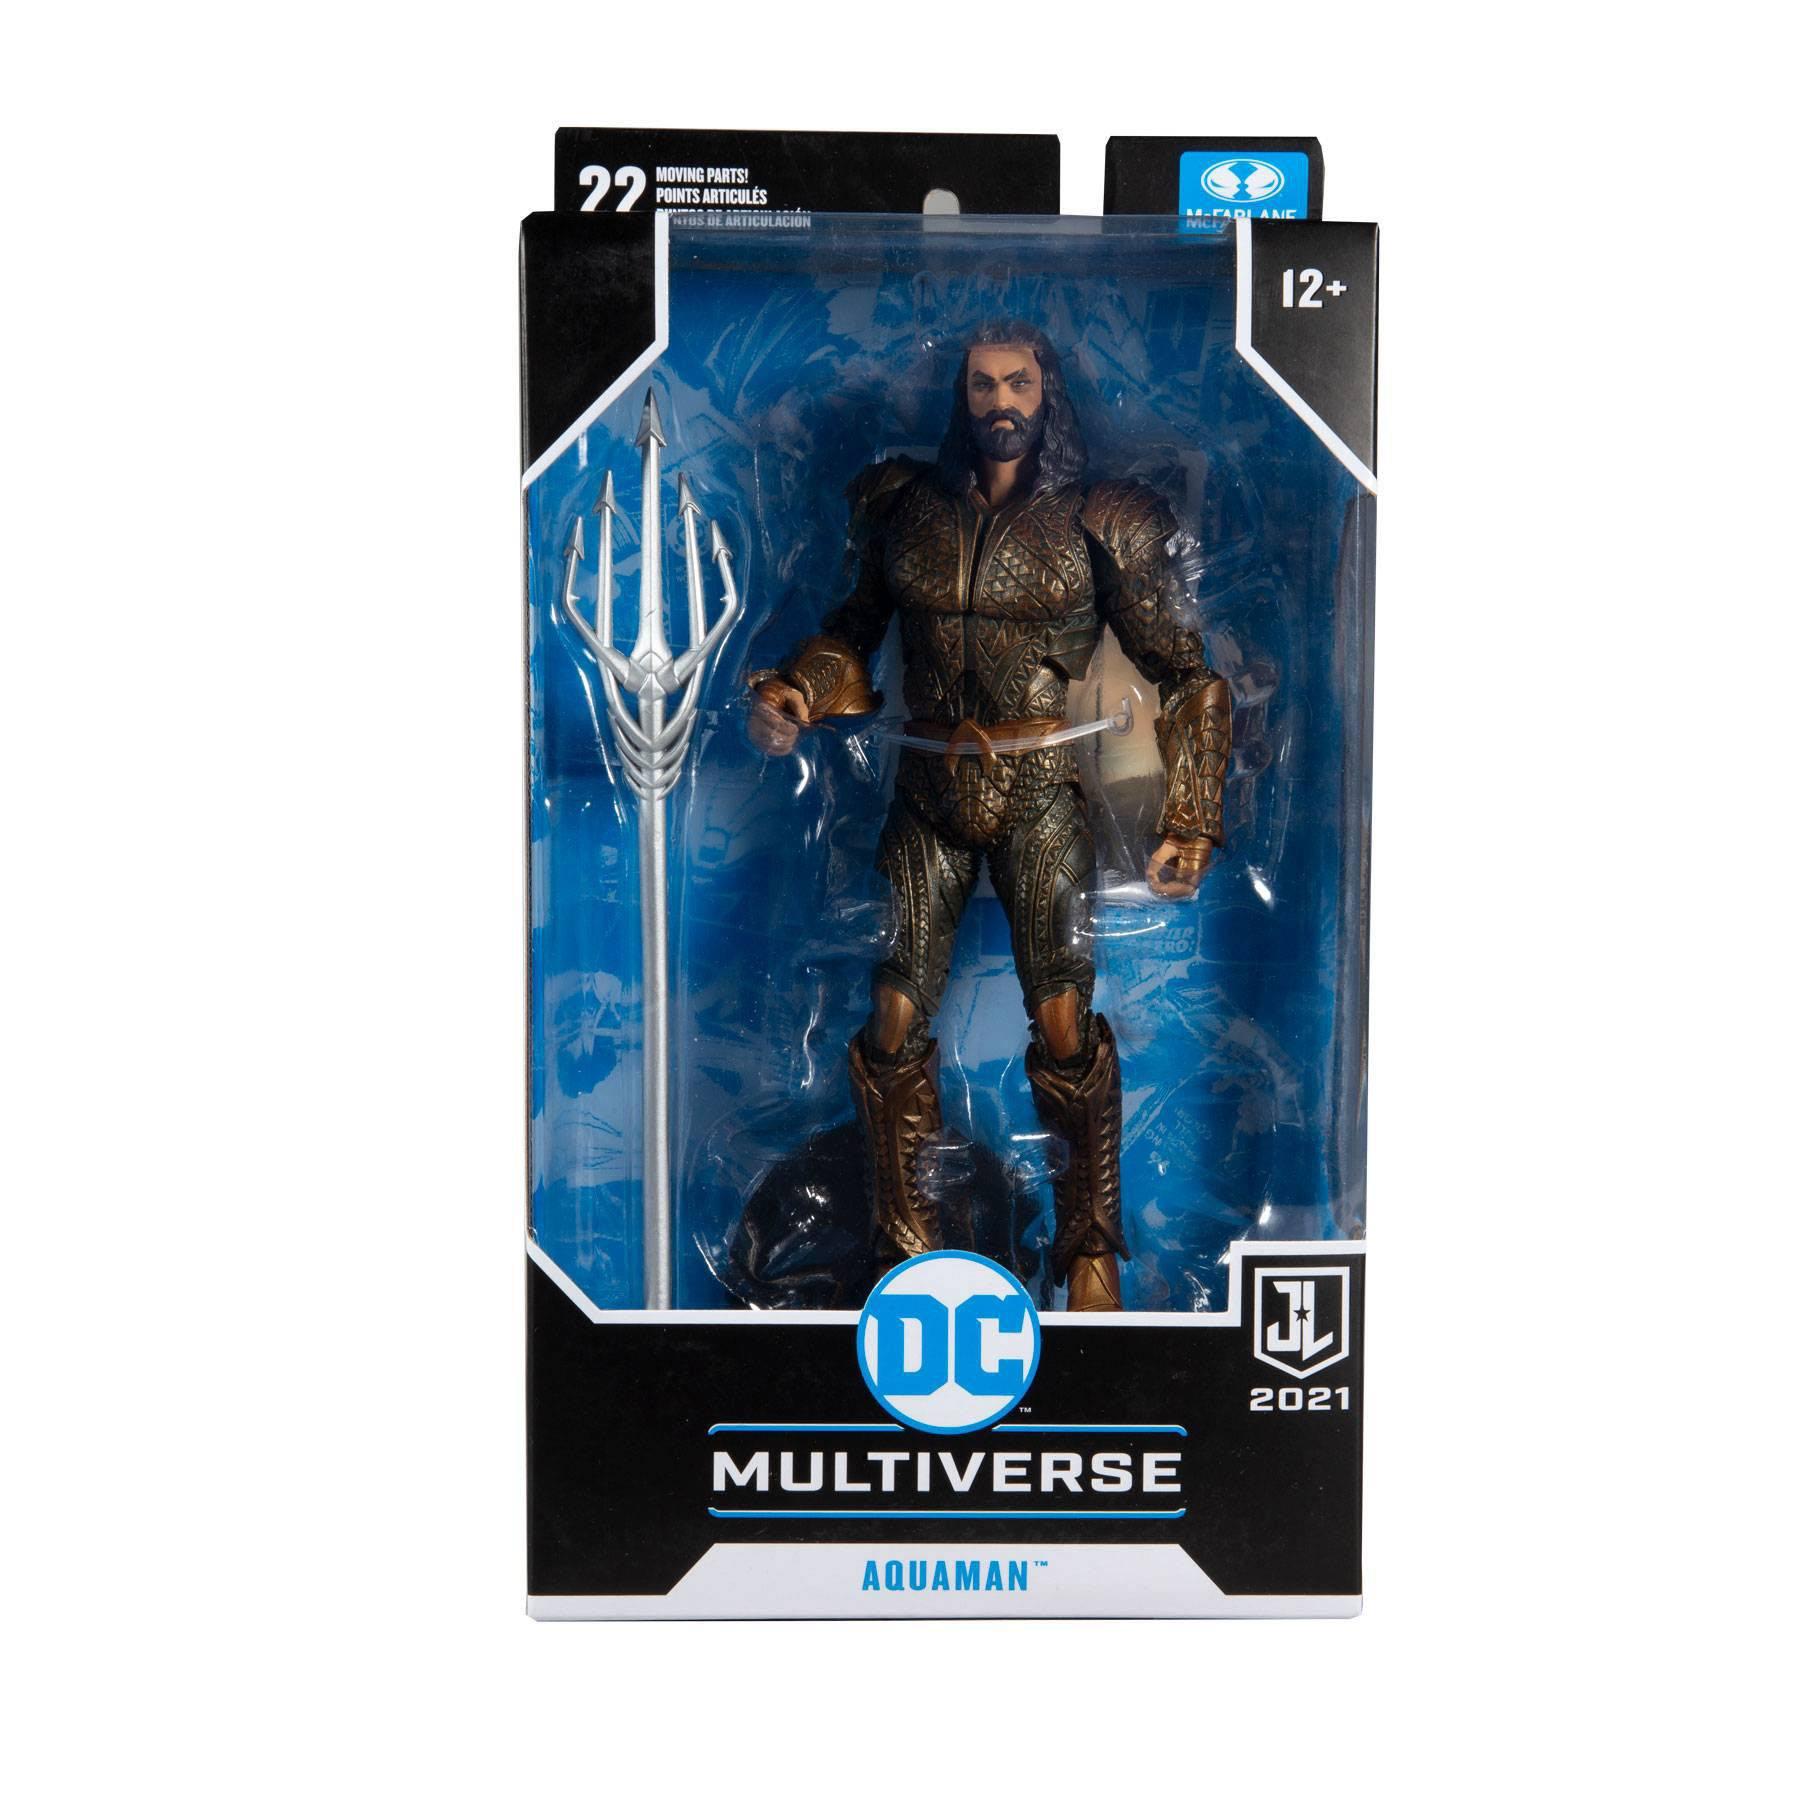 DC Justice League Movie Actionfigur Aquaman 18 cm MCF15091-9 787926150919